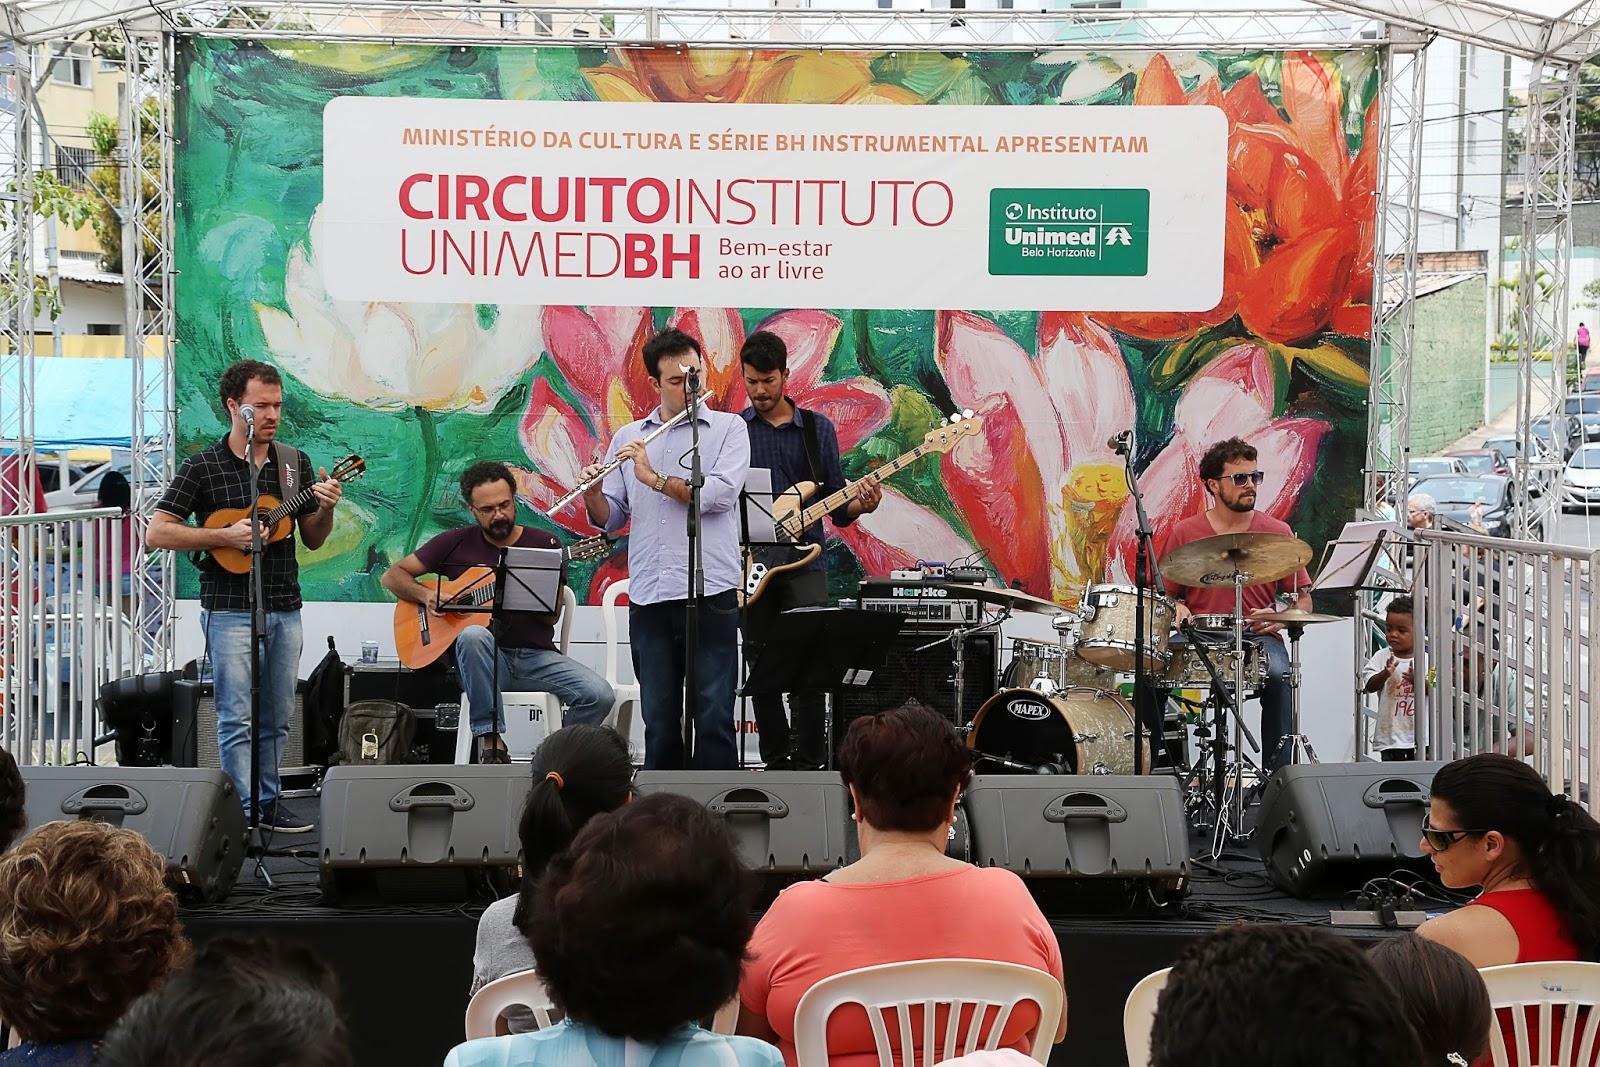 Circuito Unimed : Circuito instituto unimed bh u culturaliza bh